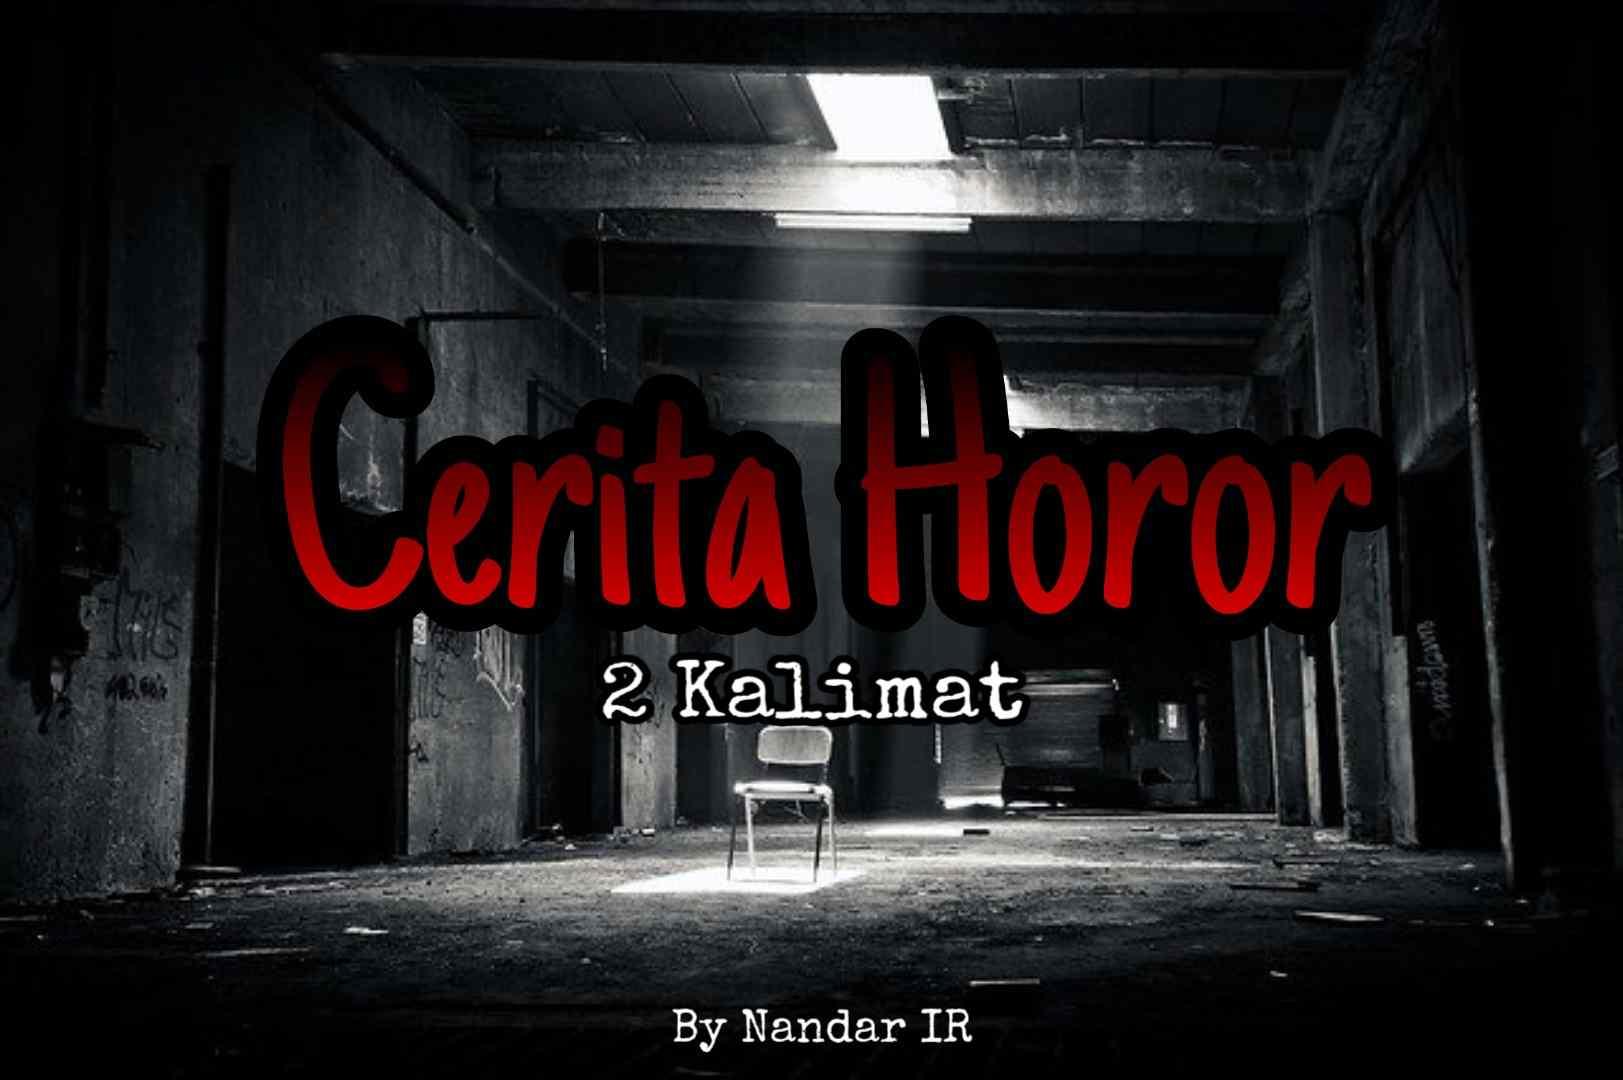 Cerita Horor 2 Kalimat